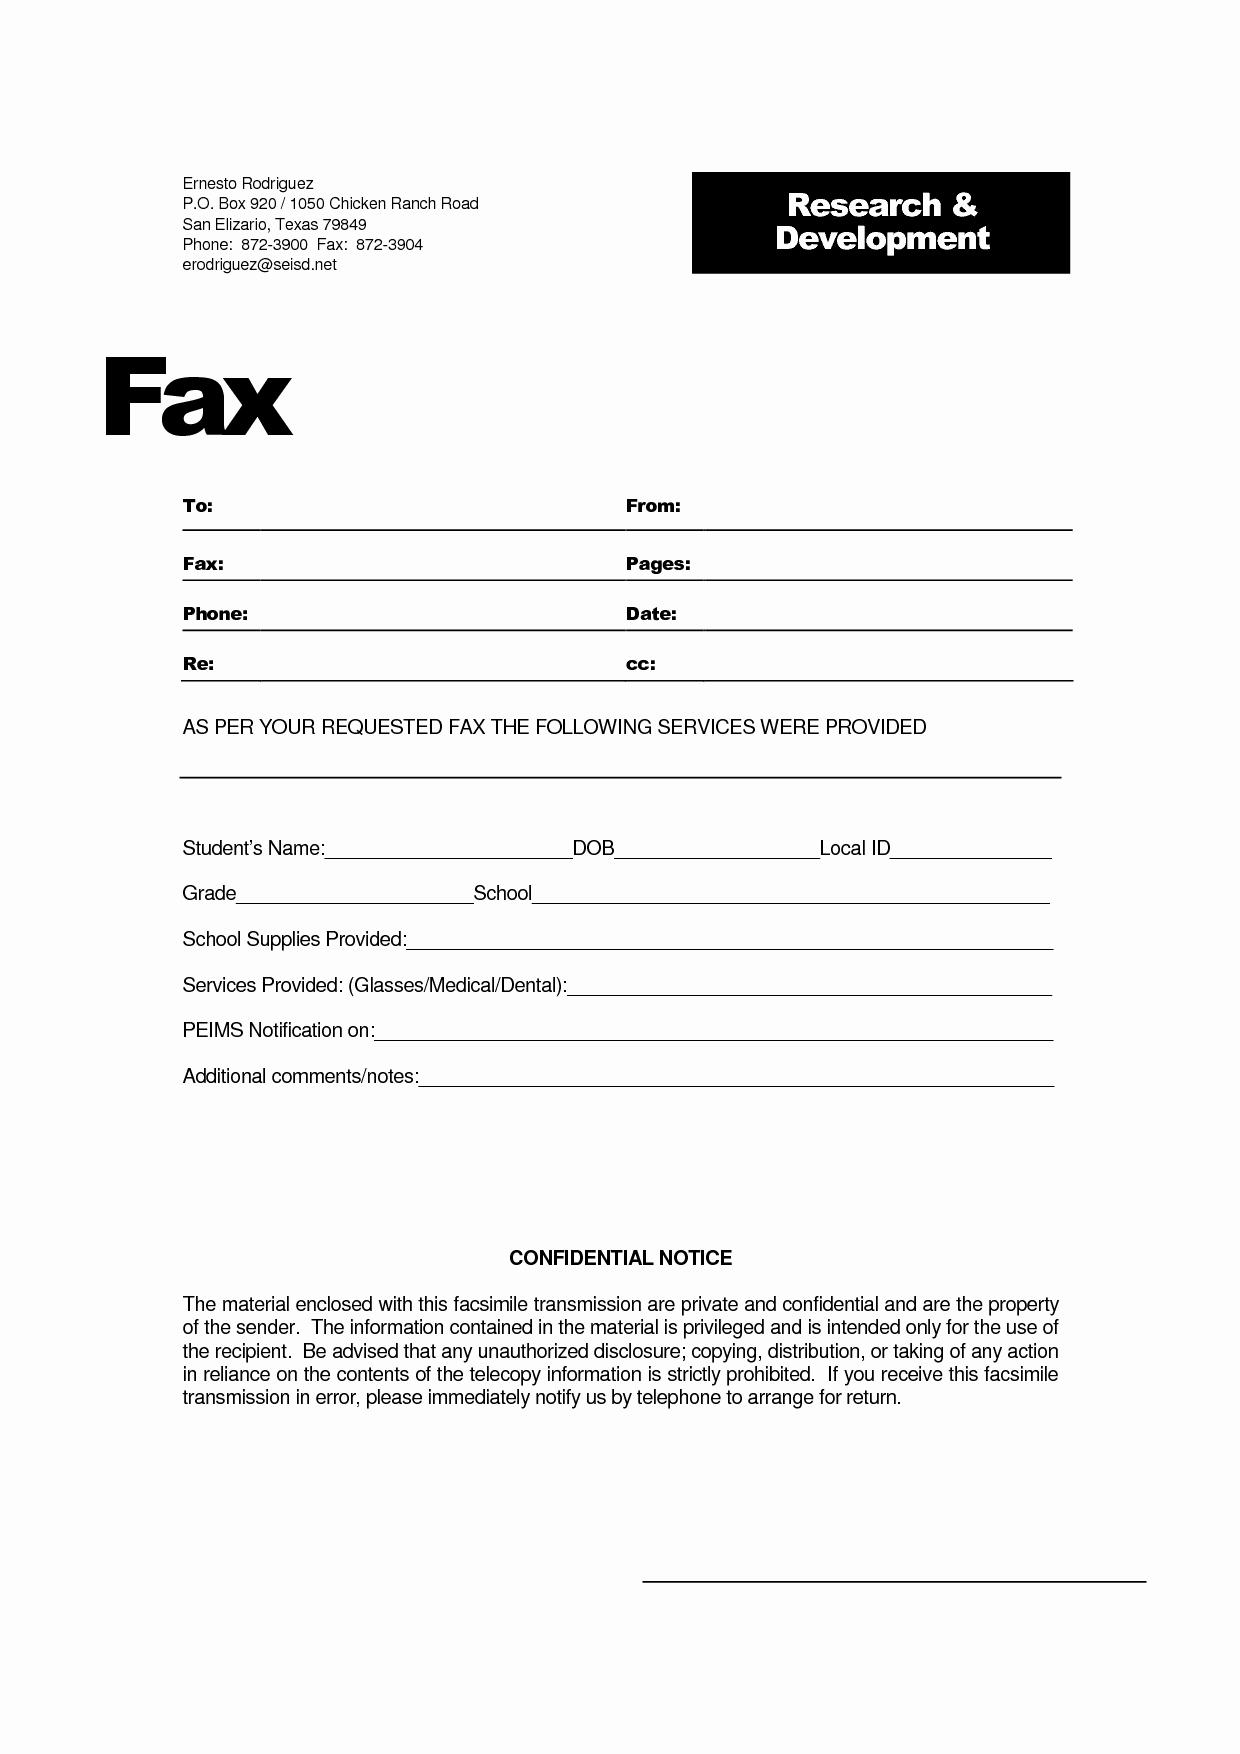 Confidential Fax Cover Sheet Pdf New Fax